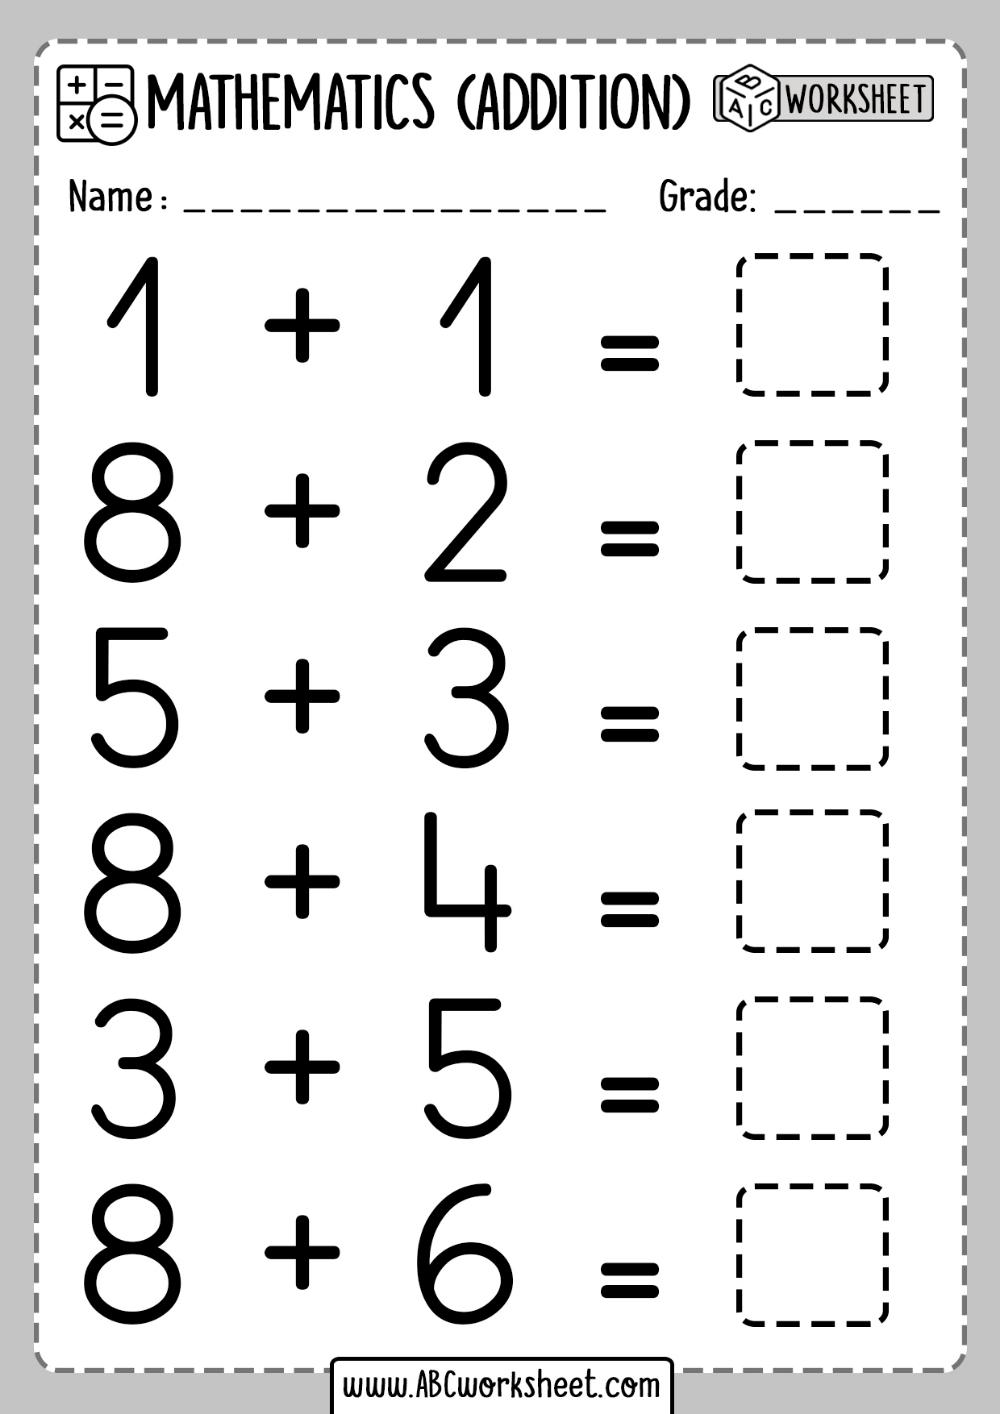 1st Grade Math Worksheet Addition - ABC Worksheet en 2020 [ 1414 x 1000 Pixel ]